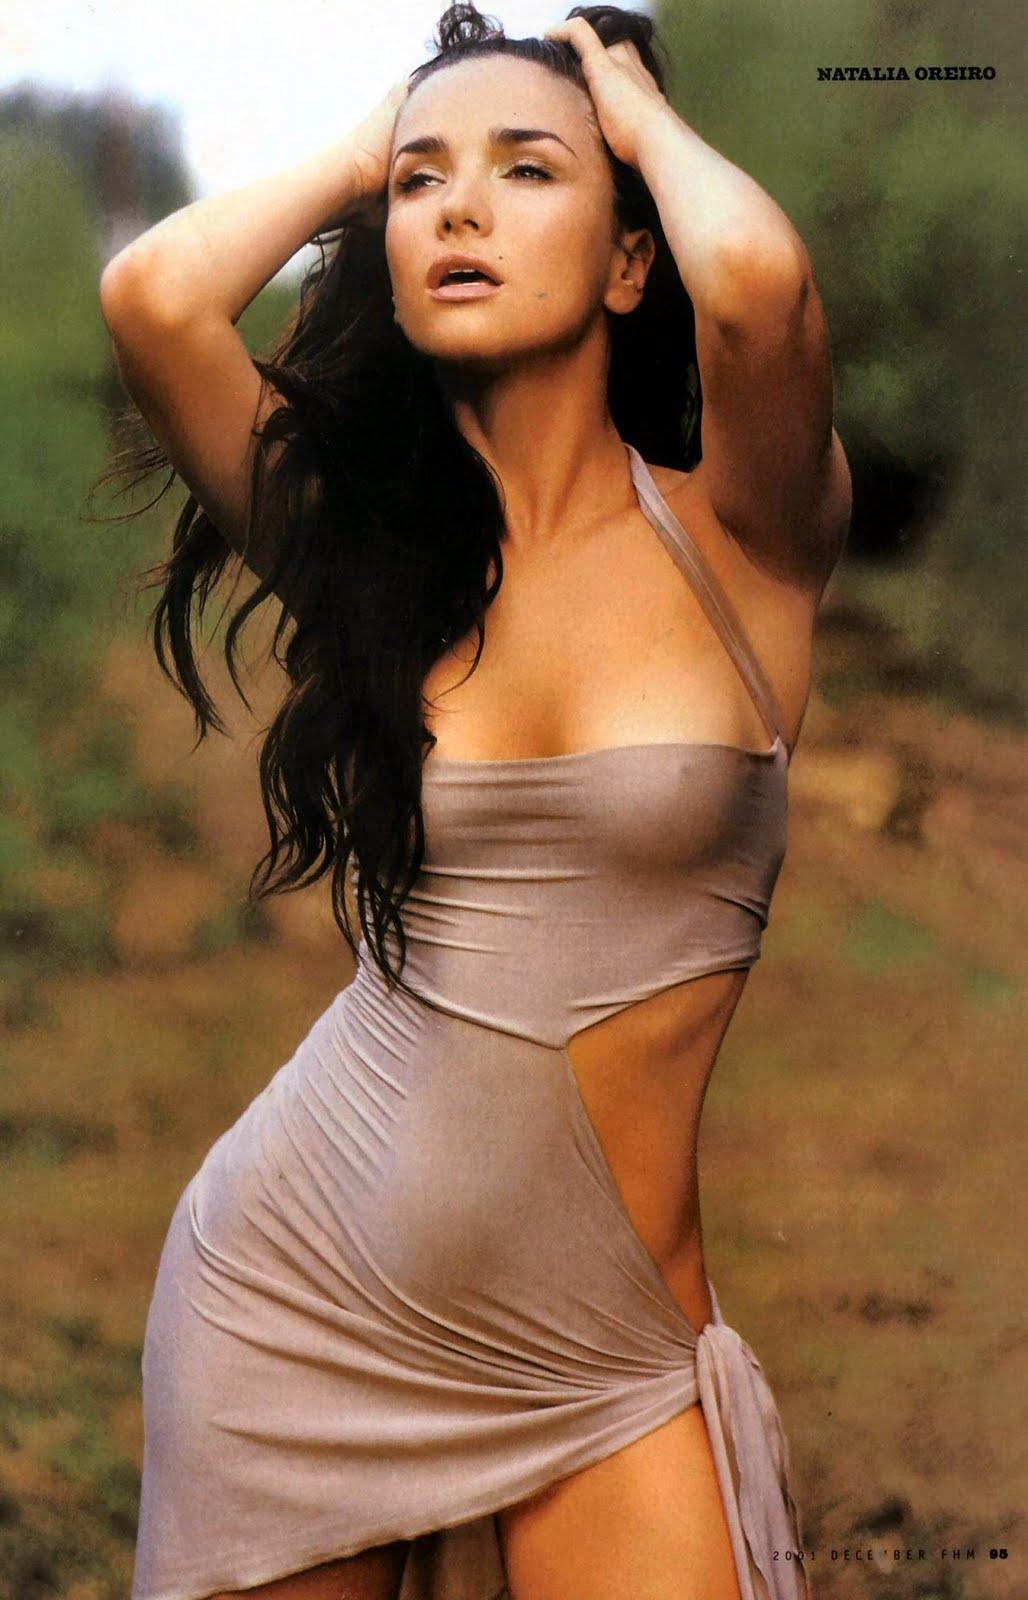 http://2.bp.blogspot.com/-paT6pn7Adp8/Tk99T8QPk6I/AAAAAAAAA2k/xKIl2FfJD5k/s1600/Natalia+Oreiro_Latina-heaven.jpg